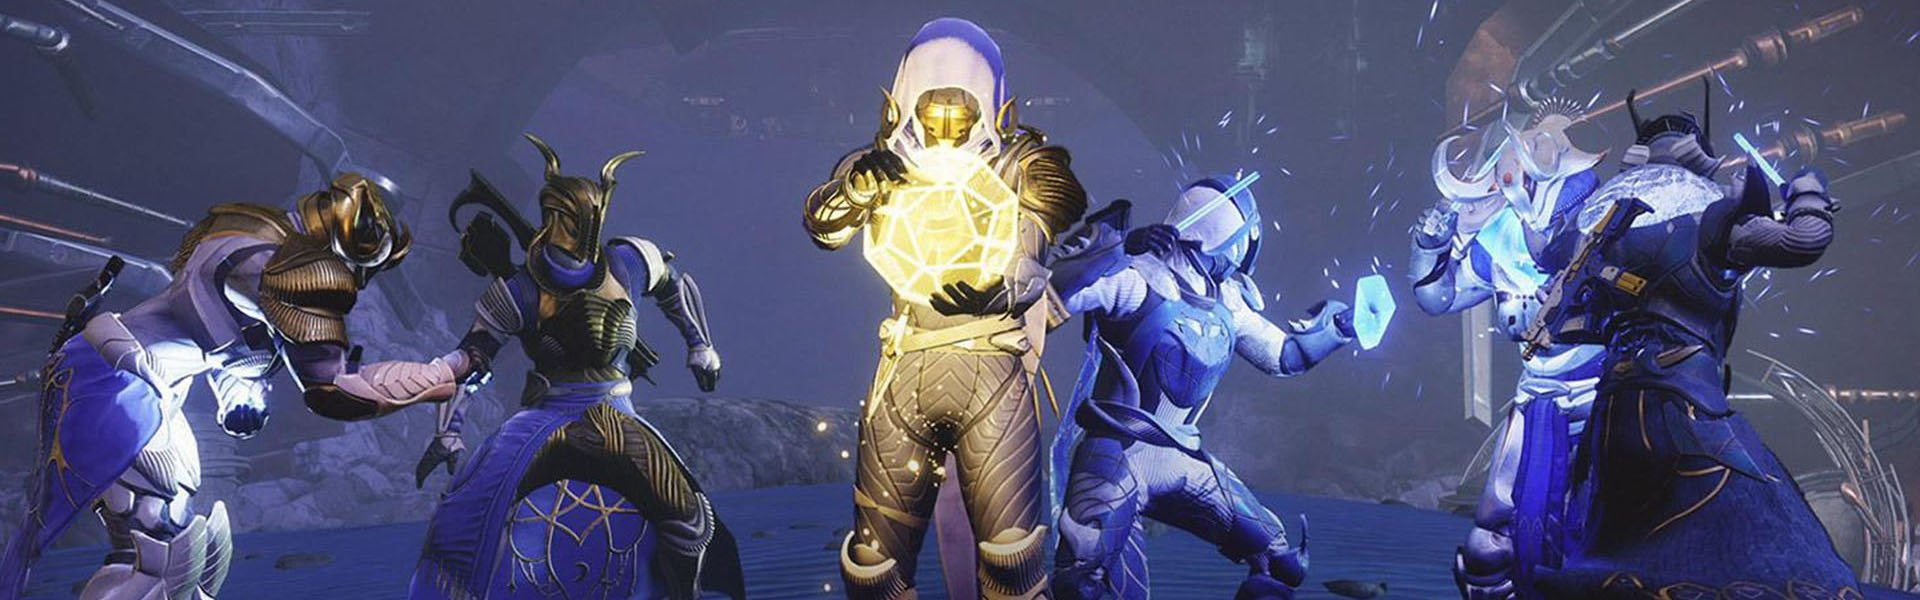 destiny-2-dawning-event-seasonal-events-guides1.jpg